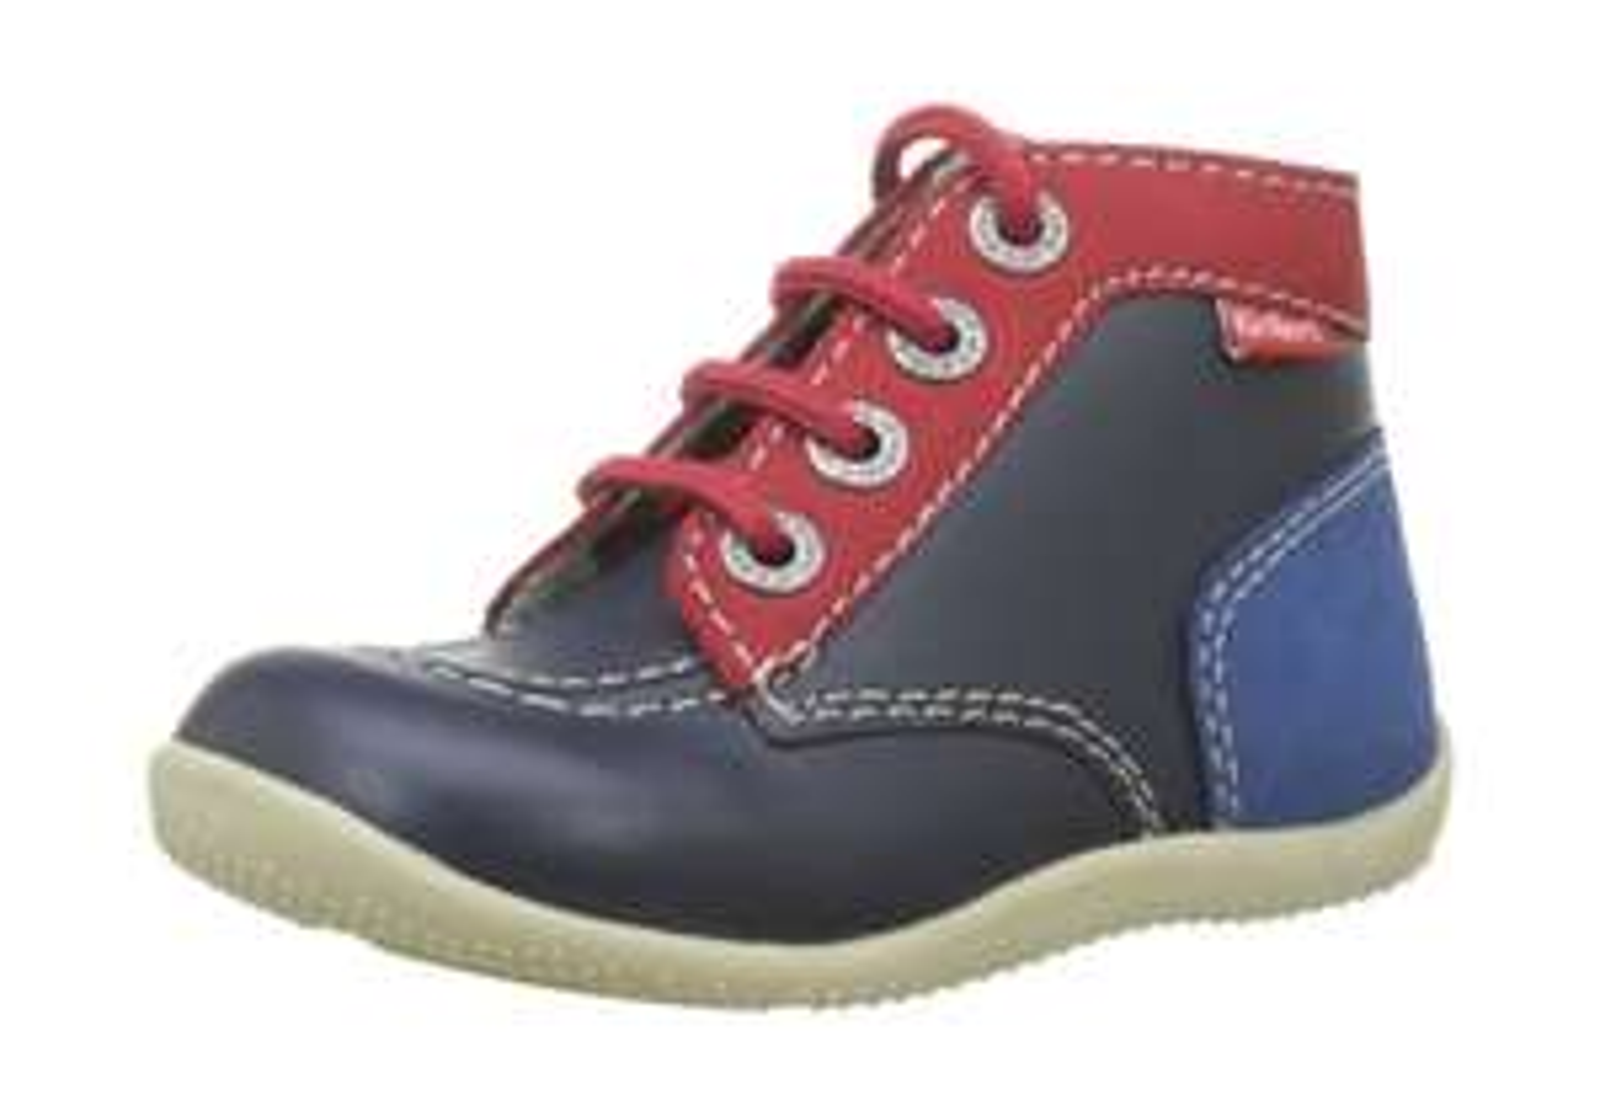 Kickers Unisex Babies' Bonbon Boots @ Amazon Size 2 Only £11.97 Prime / £16.46 Non Prime